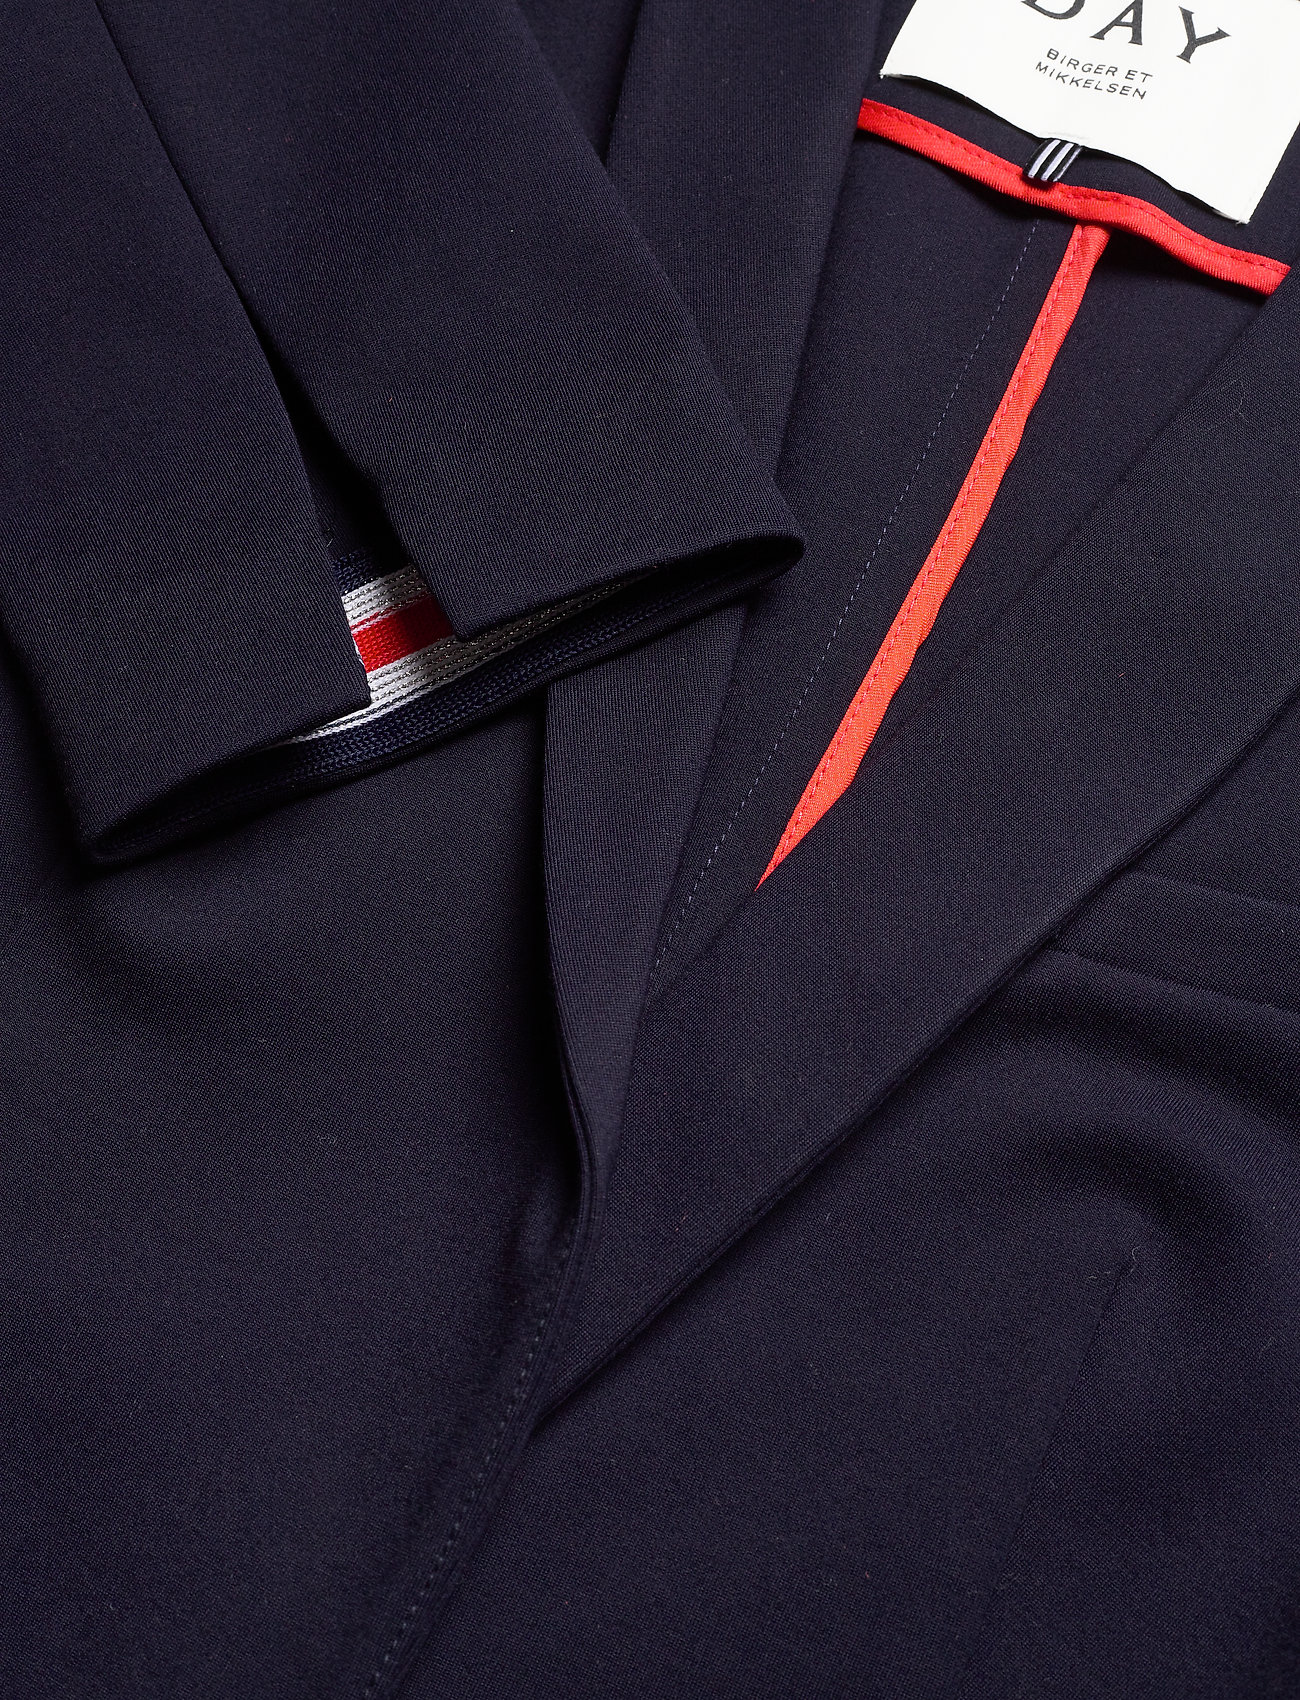 Day Birger Et Mikkelsen Weather - Vestes Tailleur Navy Blazer